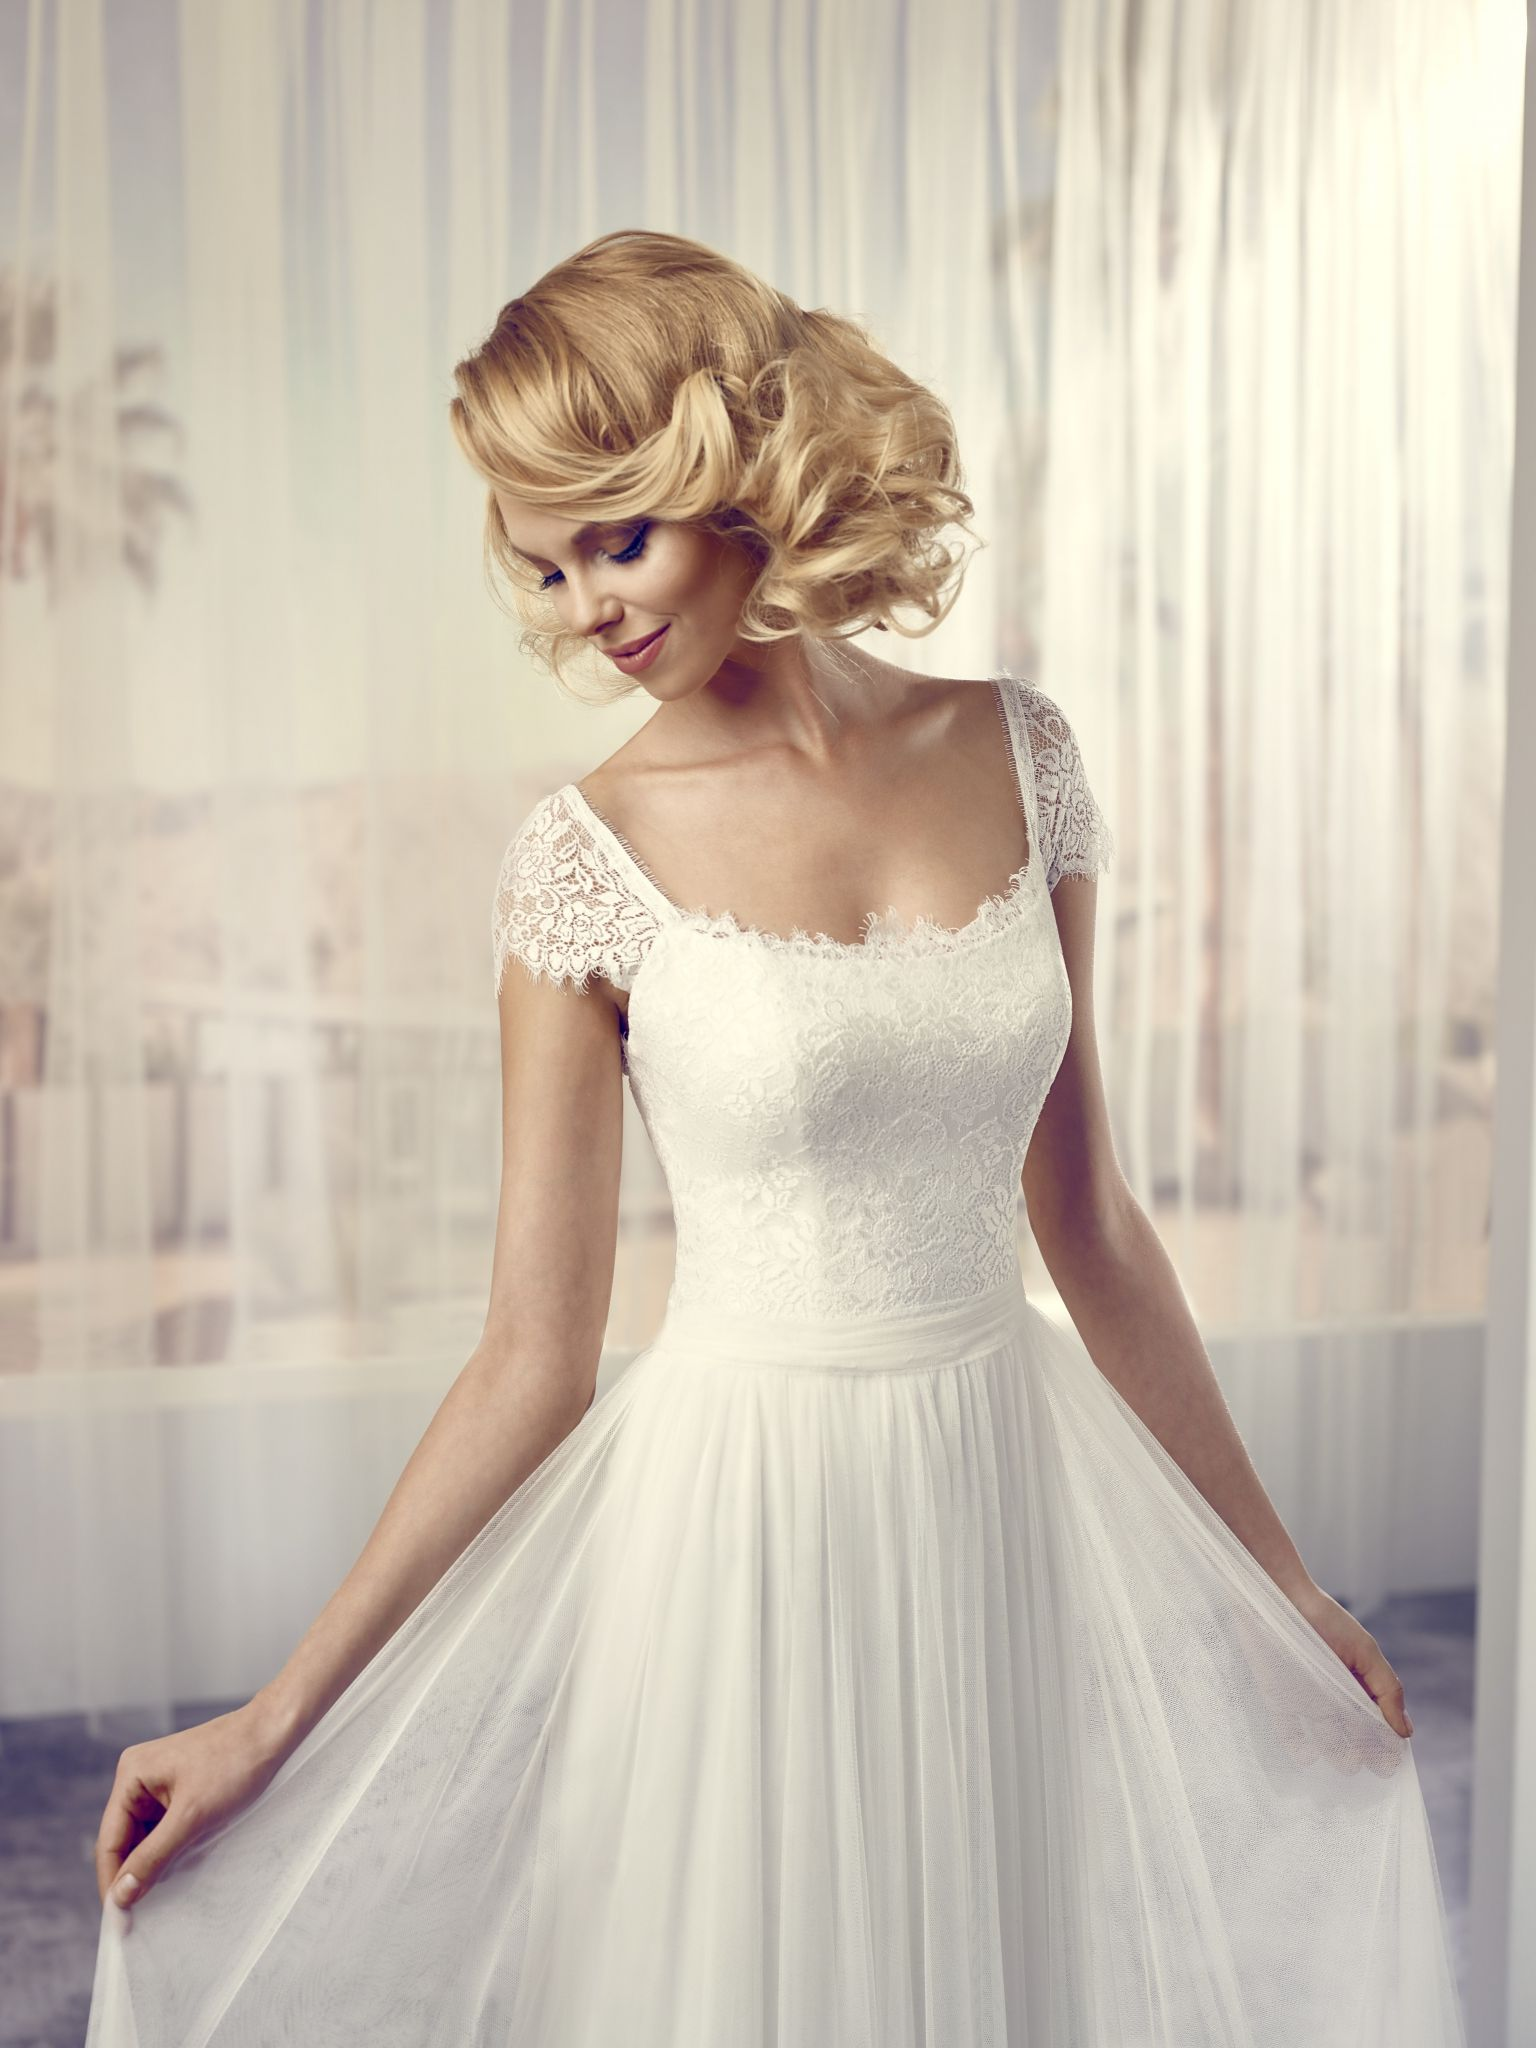 Blush wedding dress with sleeves  Le Papillon by Modeca Soft  Hochzeitskleid  Pinterest  Wedding